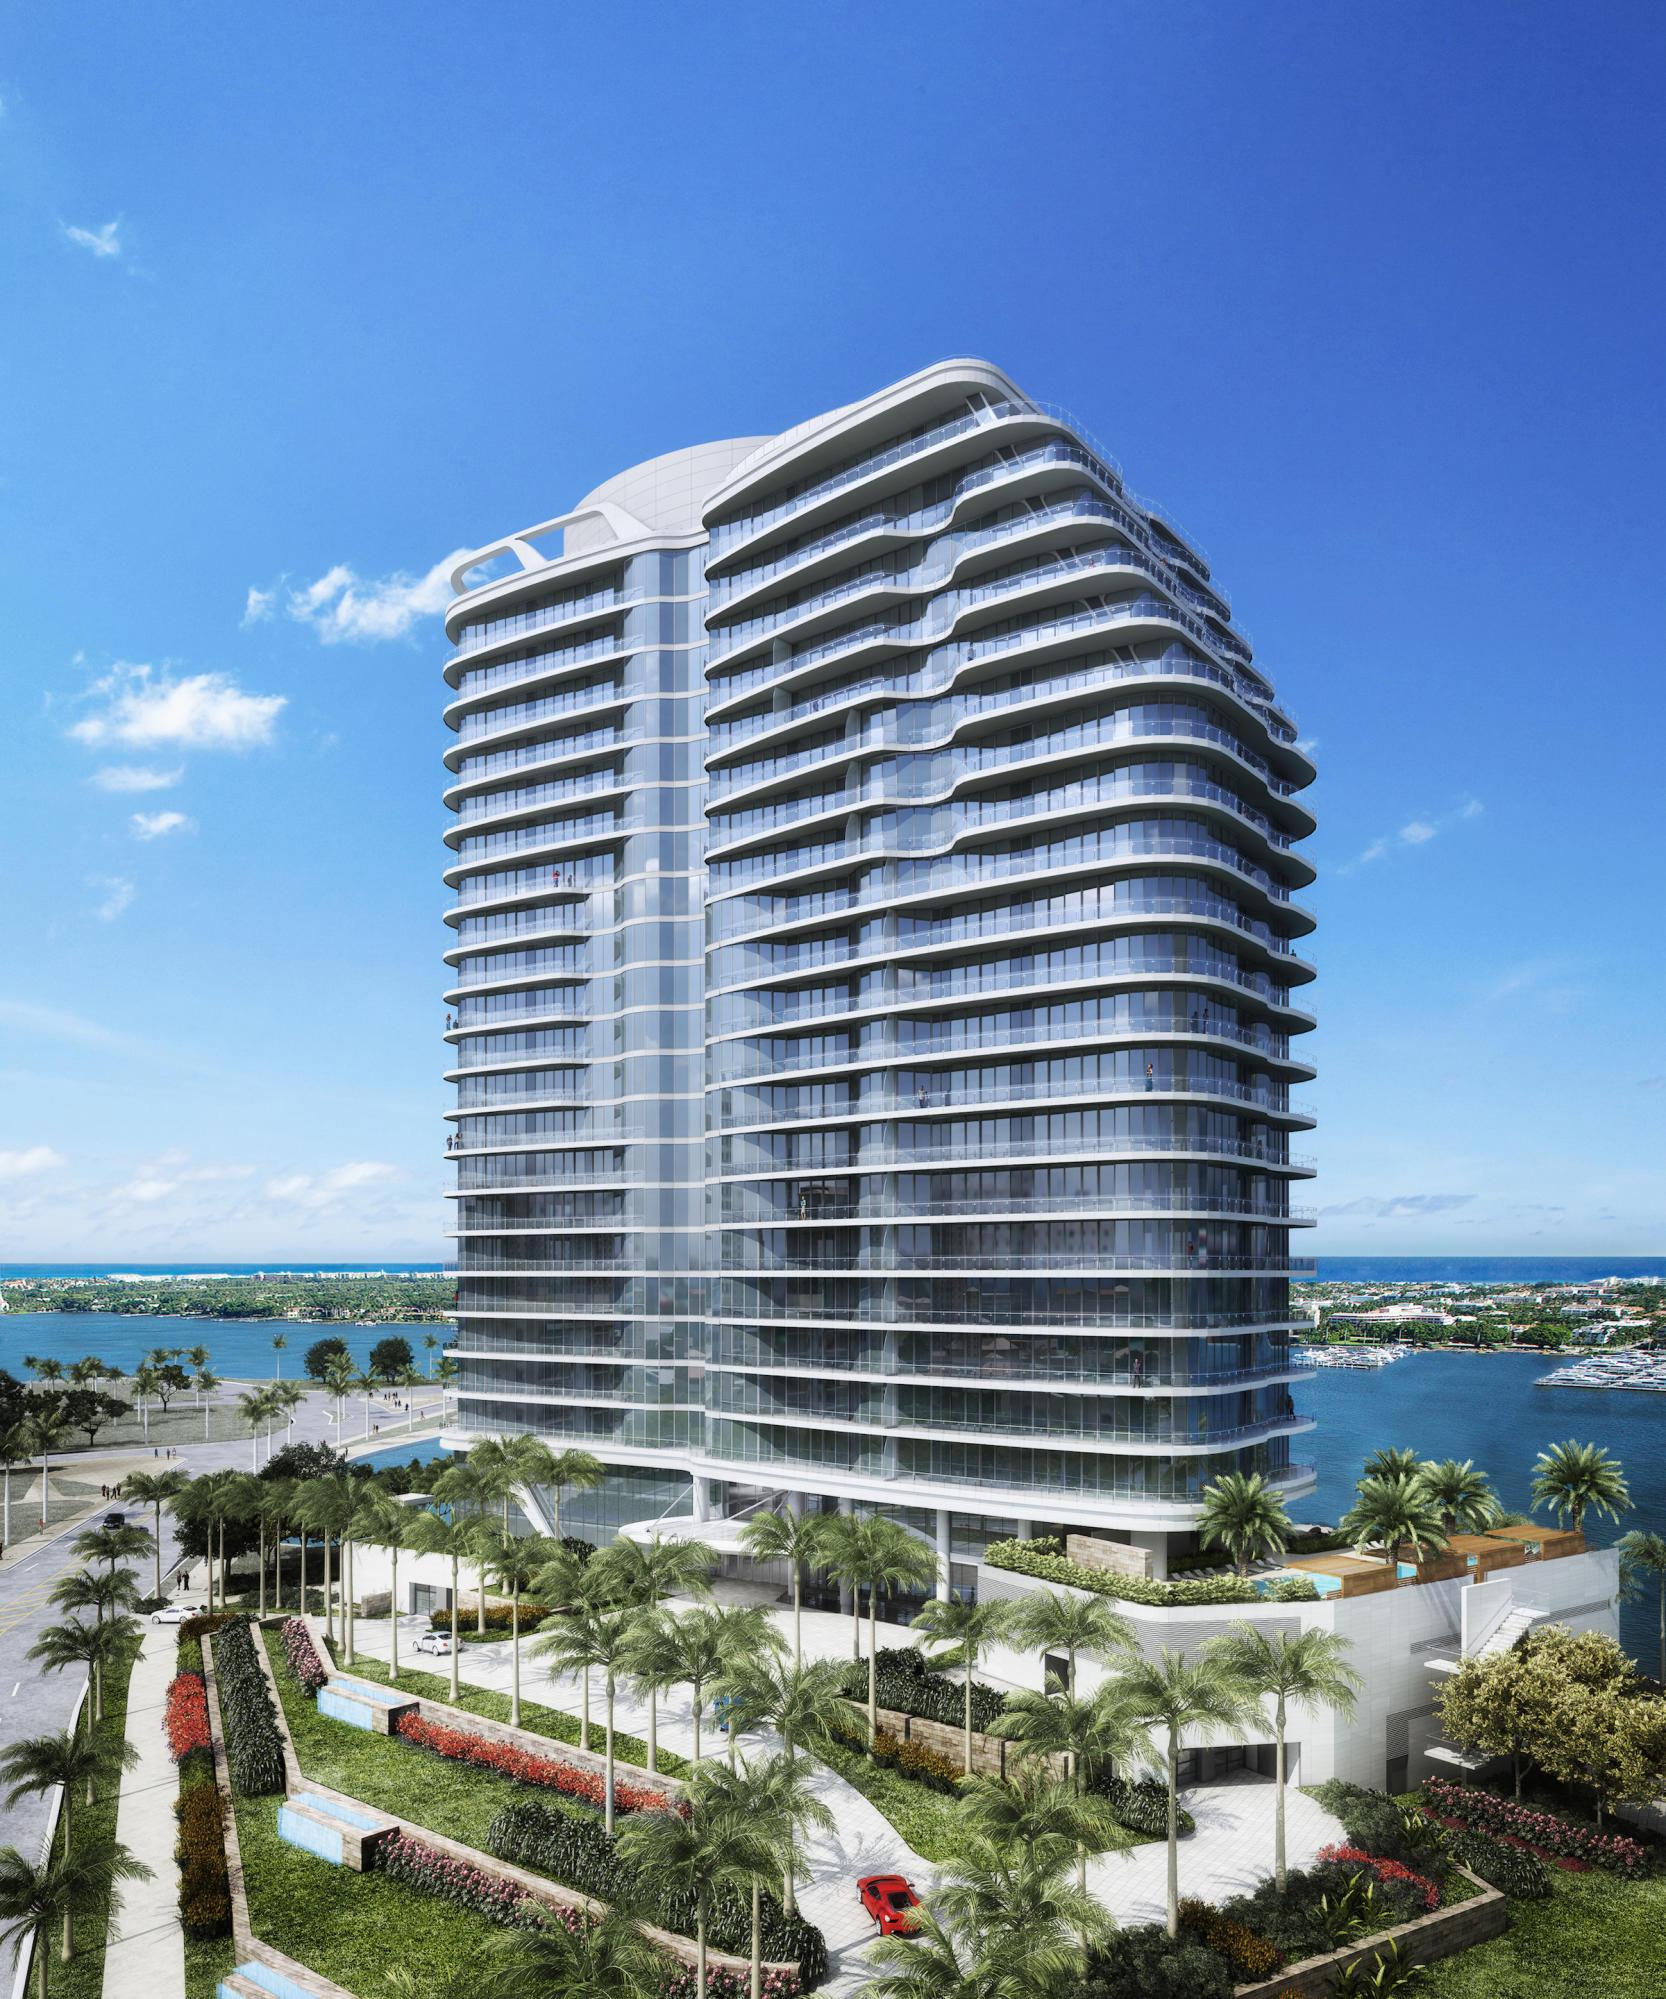 Photo of 1100 S Flagler Drive #11d, West Palm Beach, FL 33401